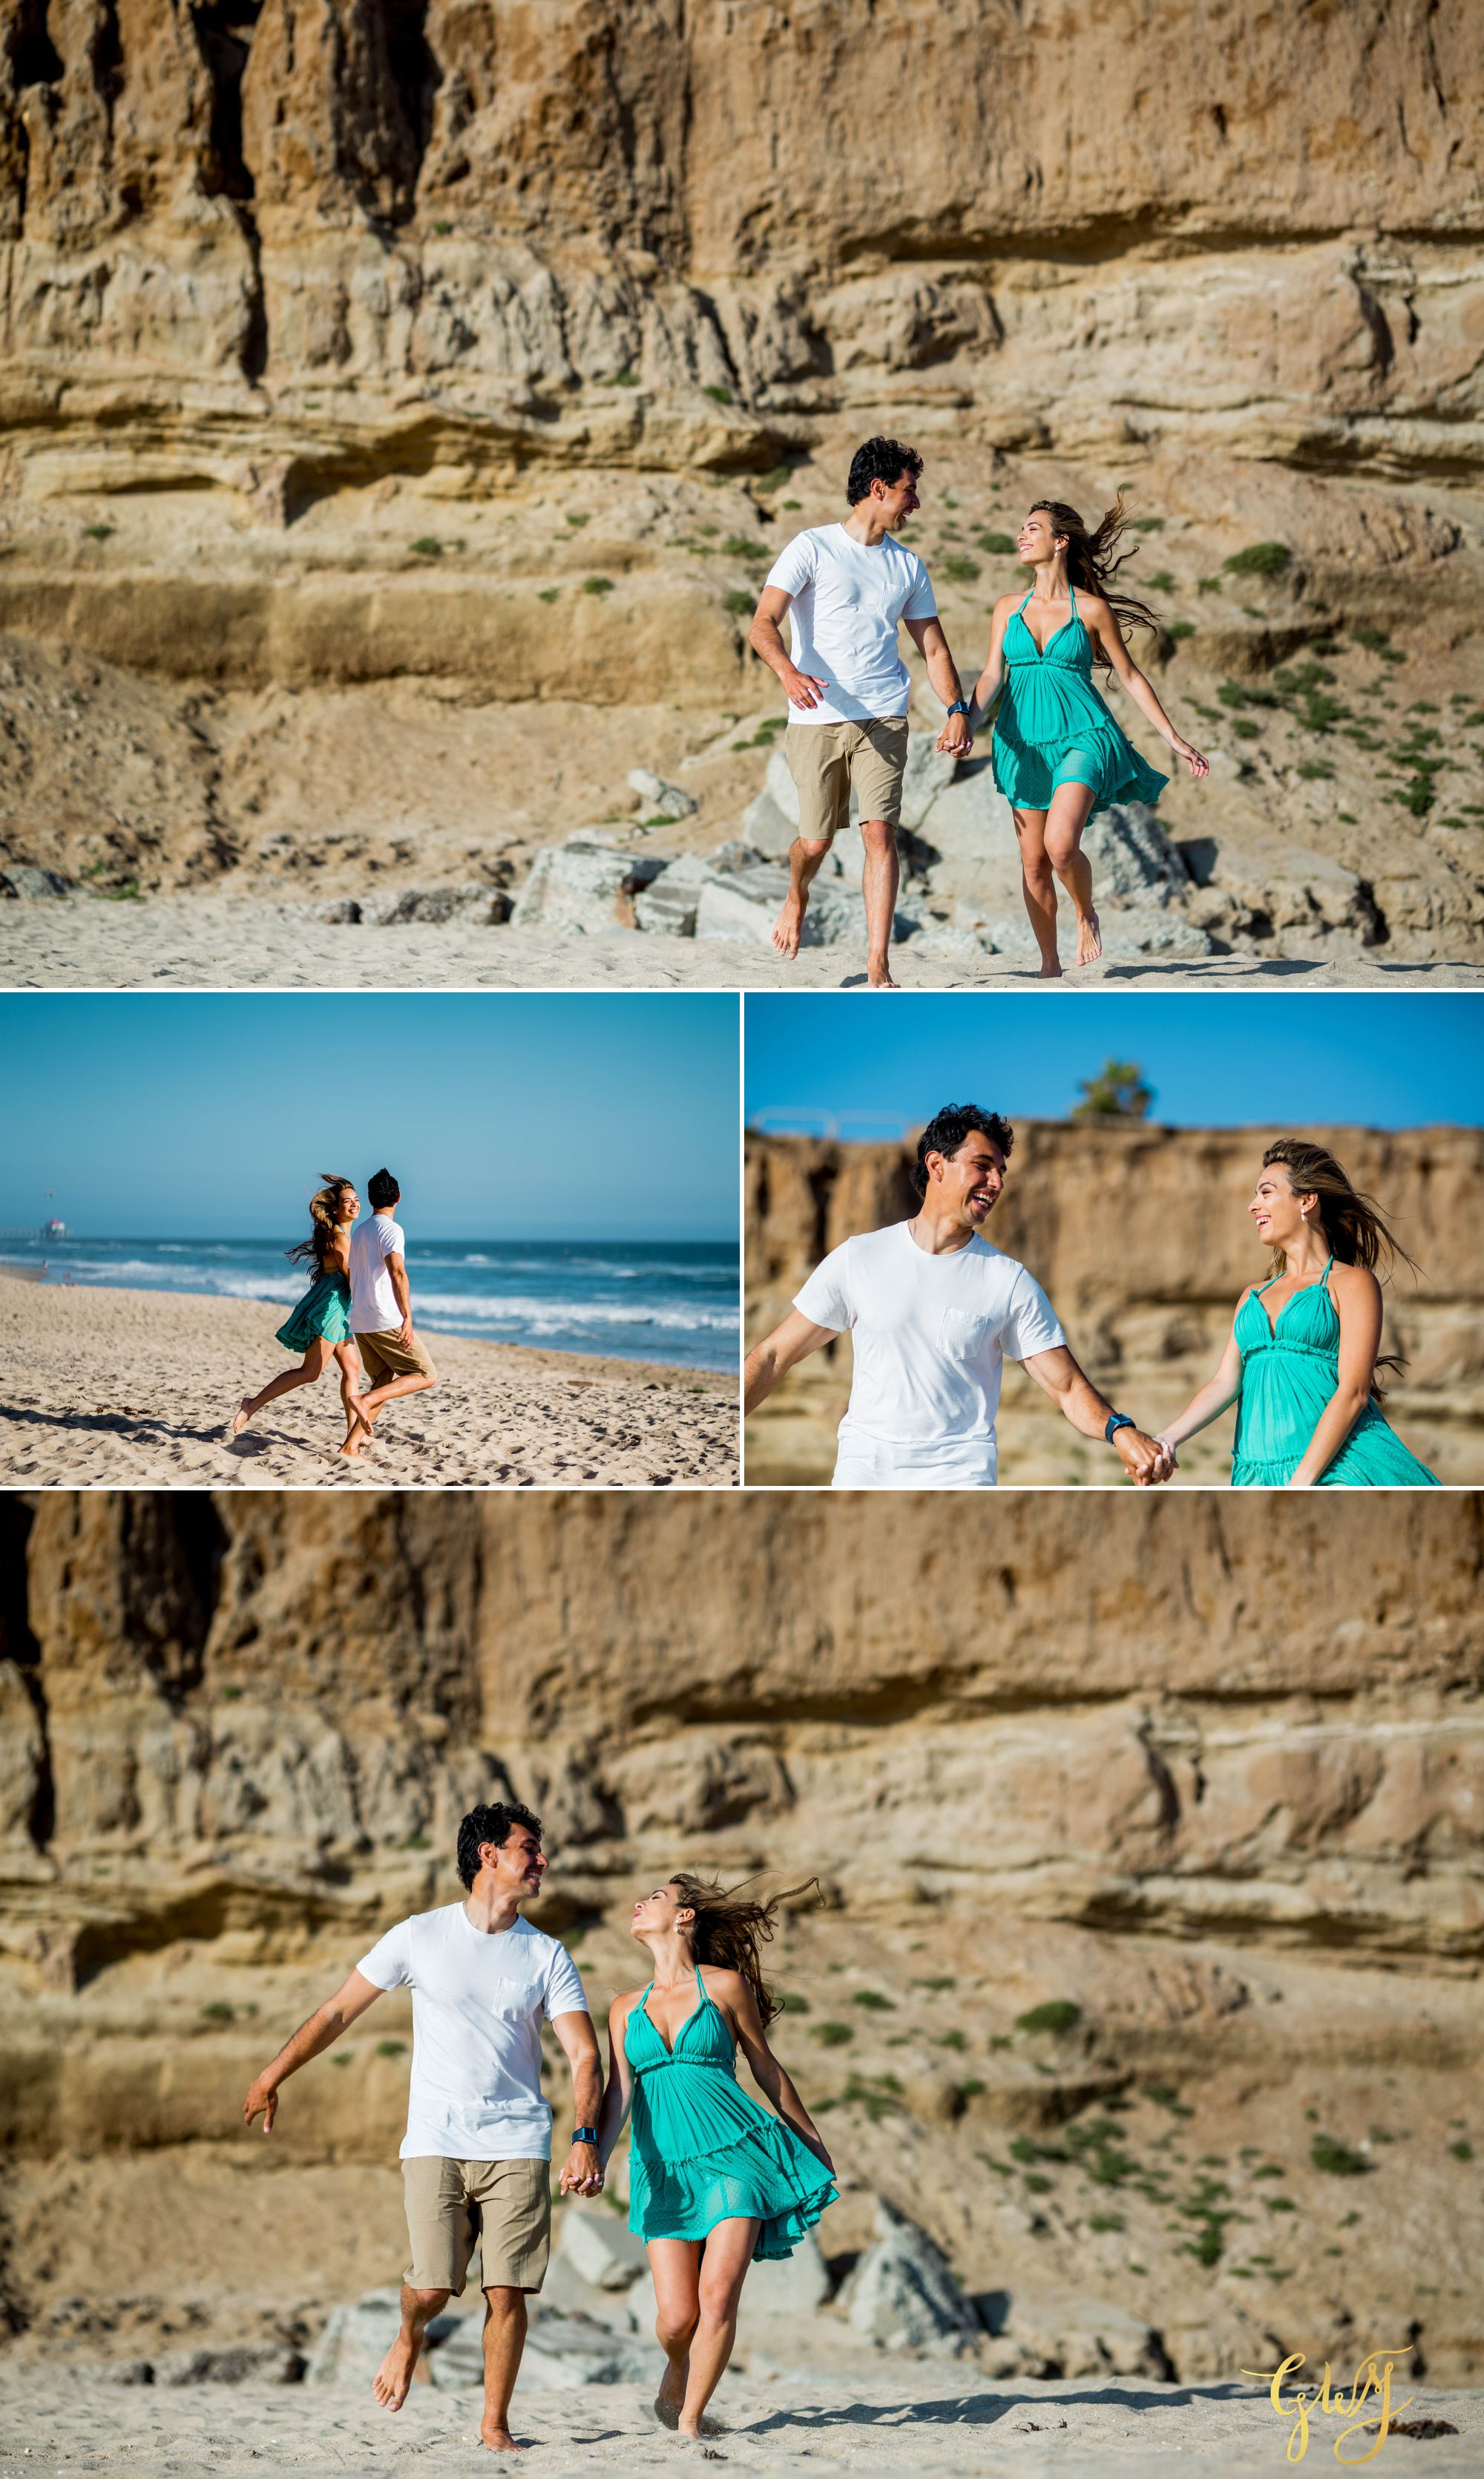 Felipe + Isabella Huntington Beach Summer Sunset Engagement Session by Glass Woods Media 5.jpg